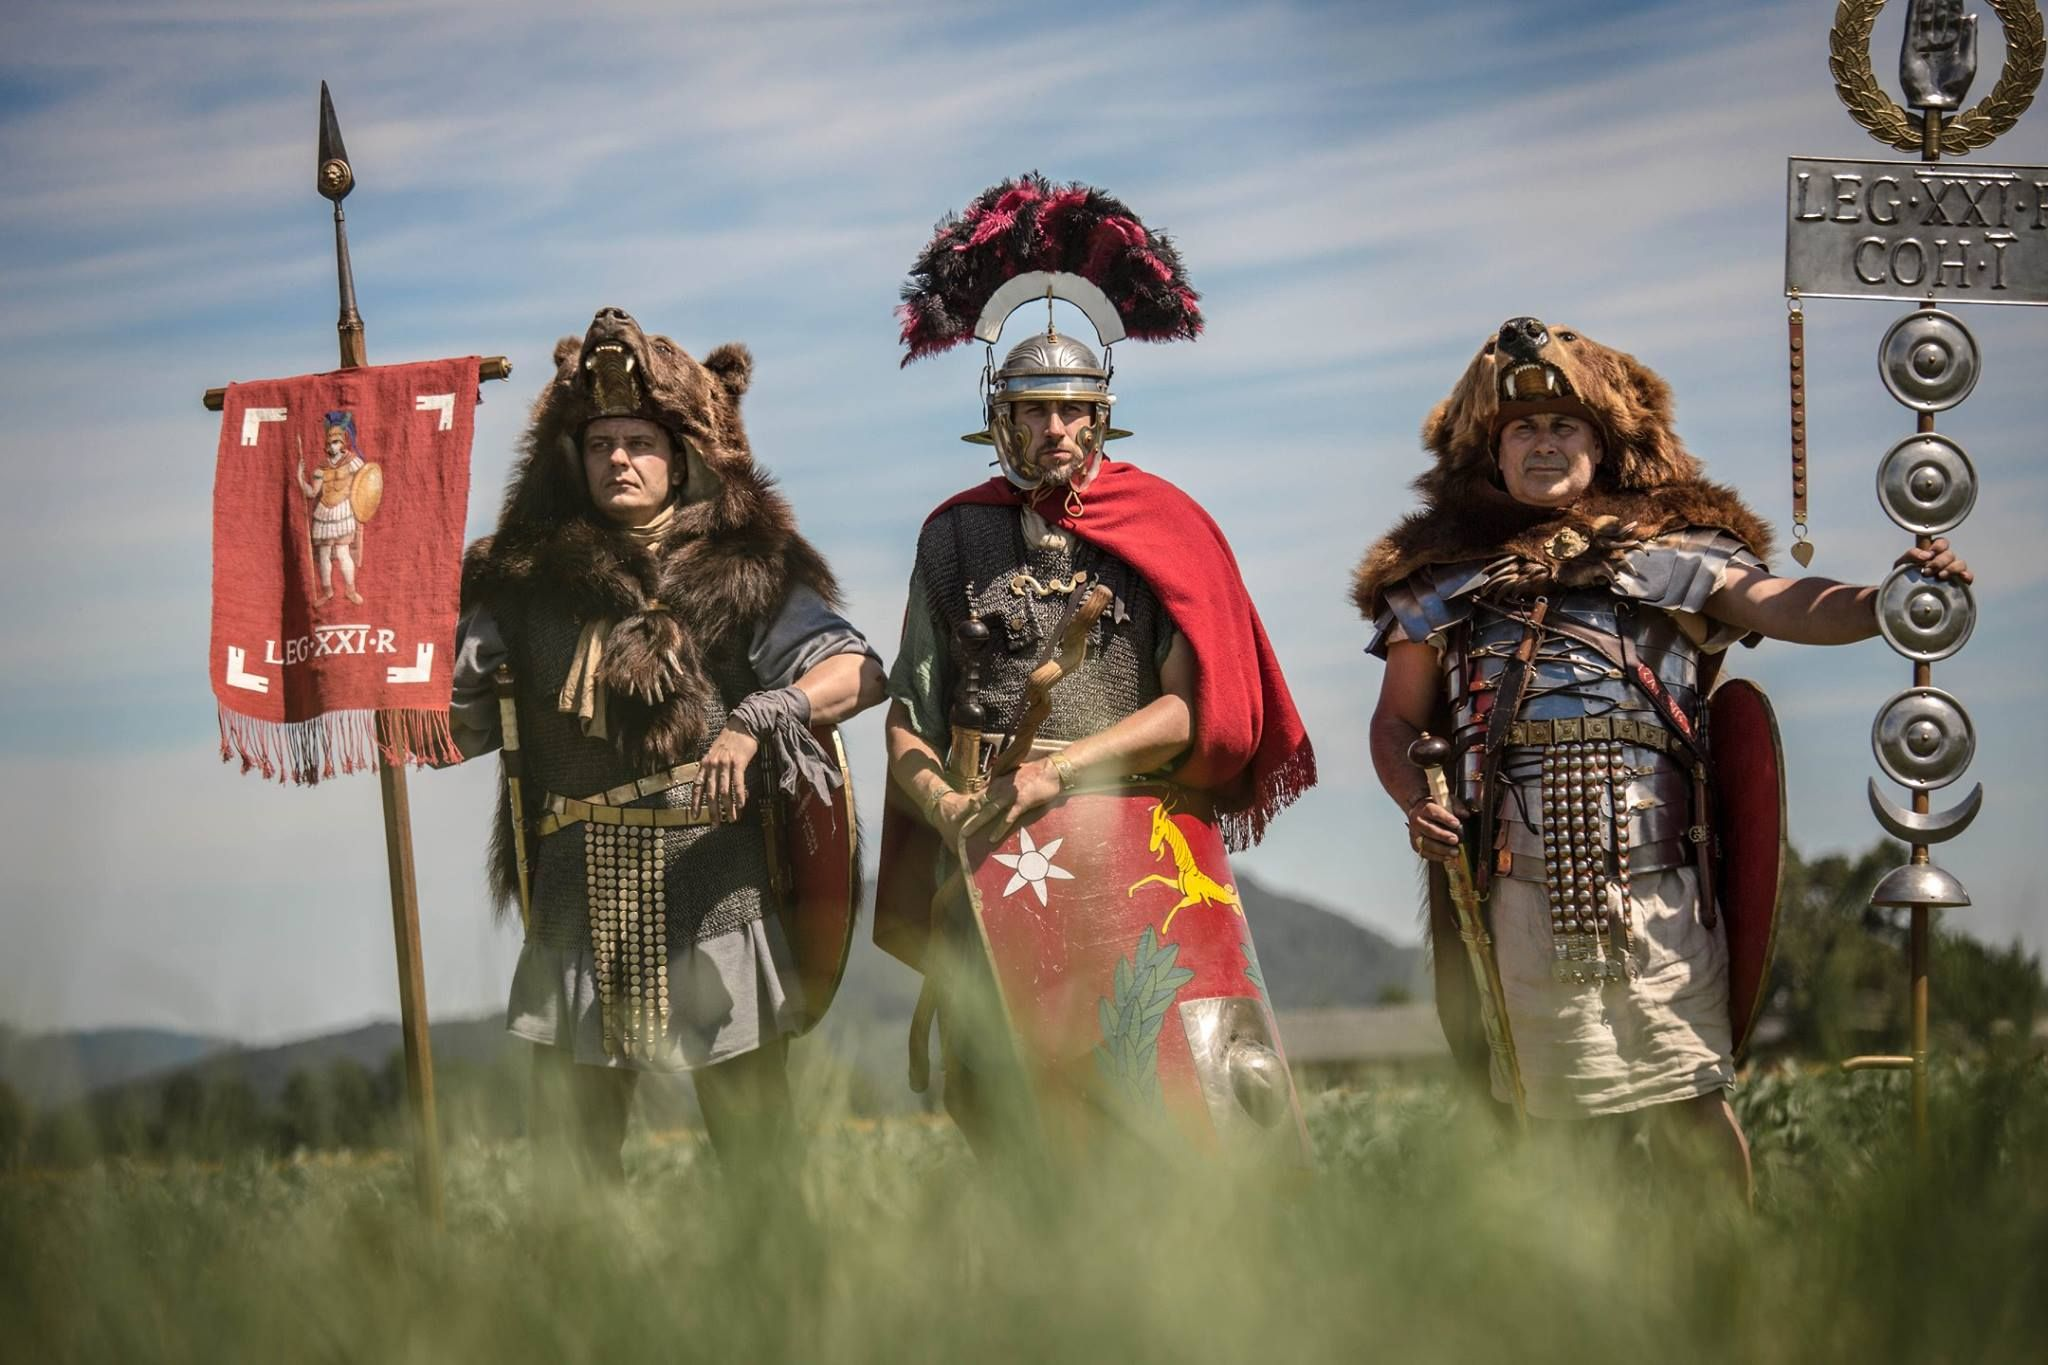 Vexilifer, centurio and signifer of Legio XXI Rapax. Historical reenactment of Roman Legions.